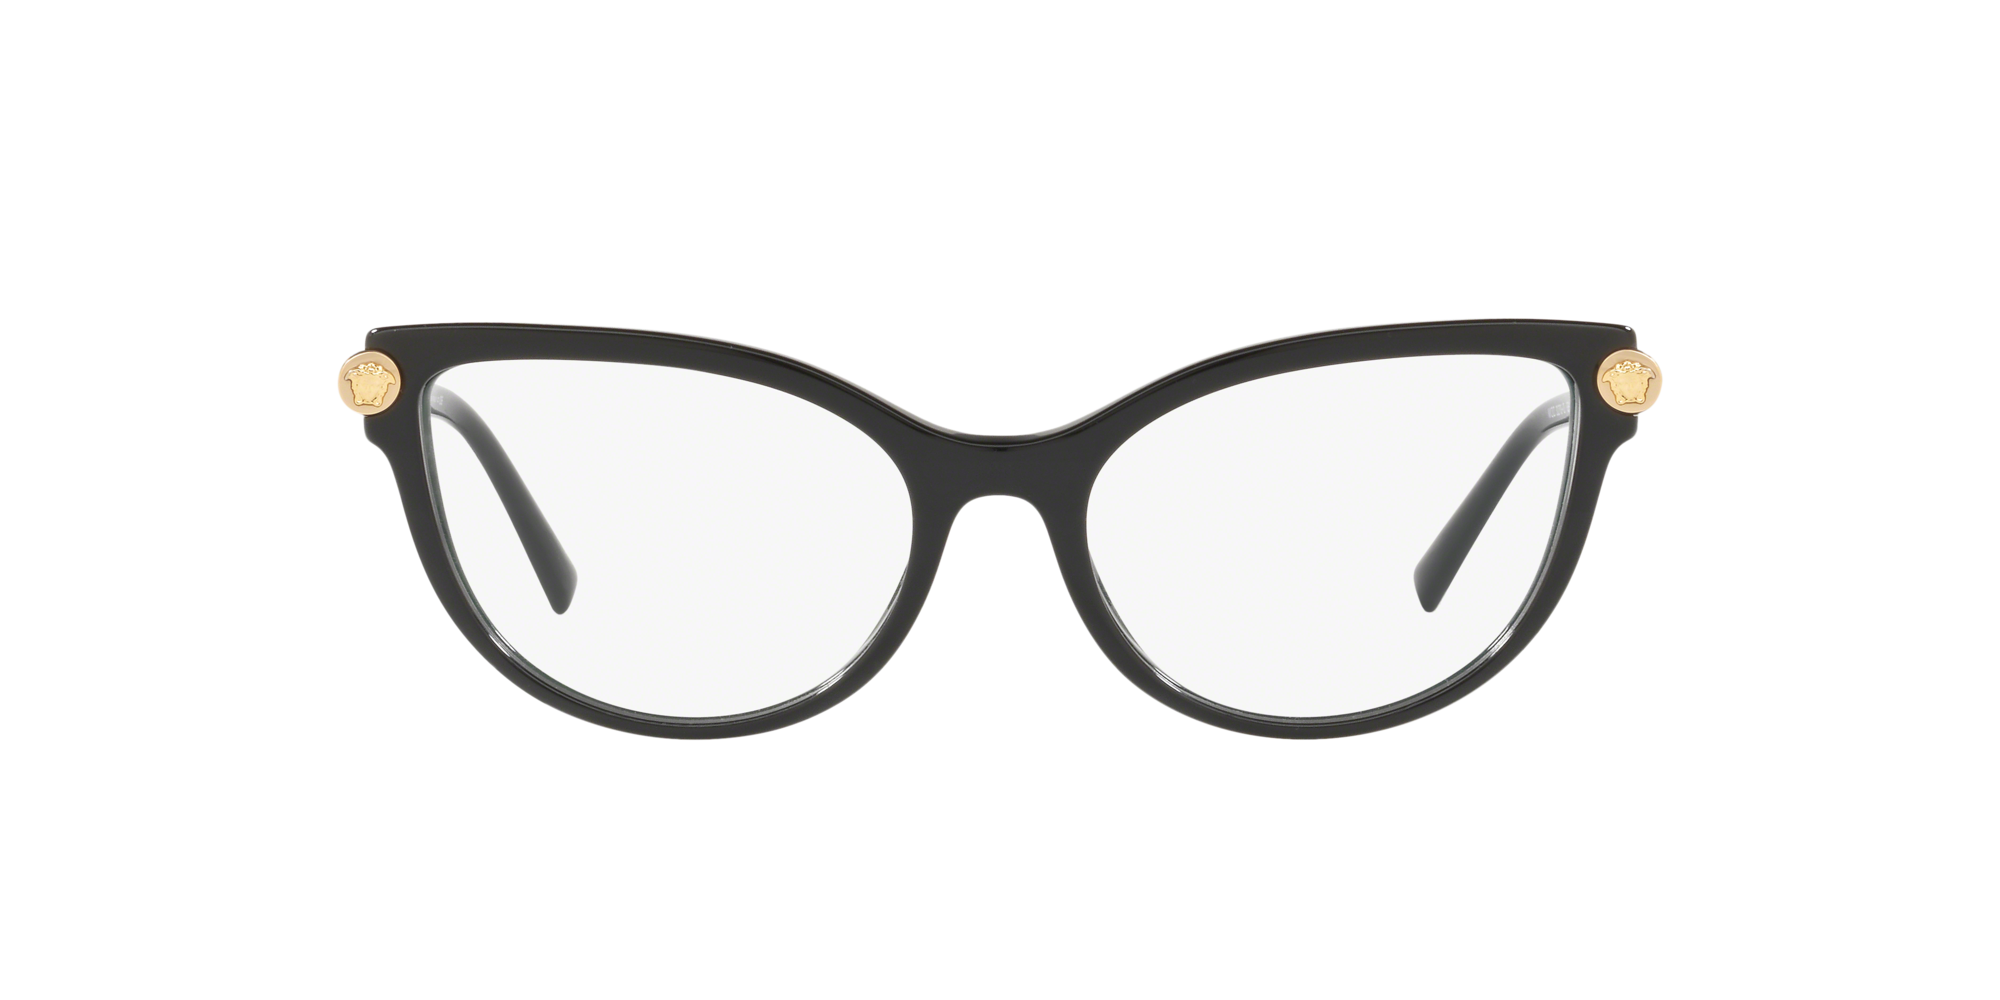 Image for VE3270Q from LensCrafters | Glasses, Prescription Glasses Online, Eyewear